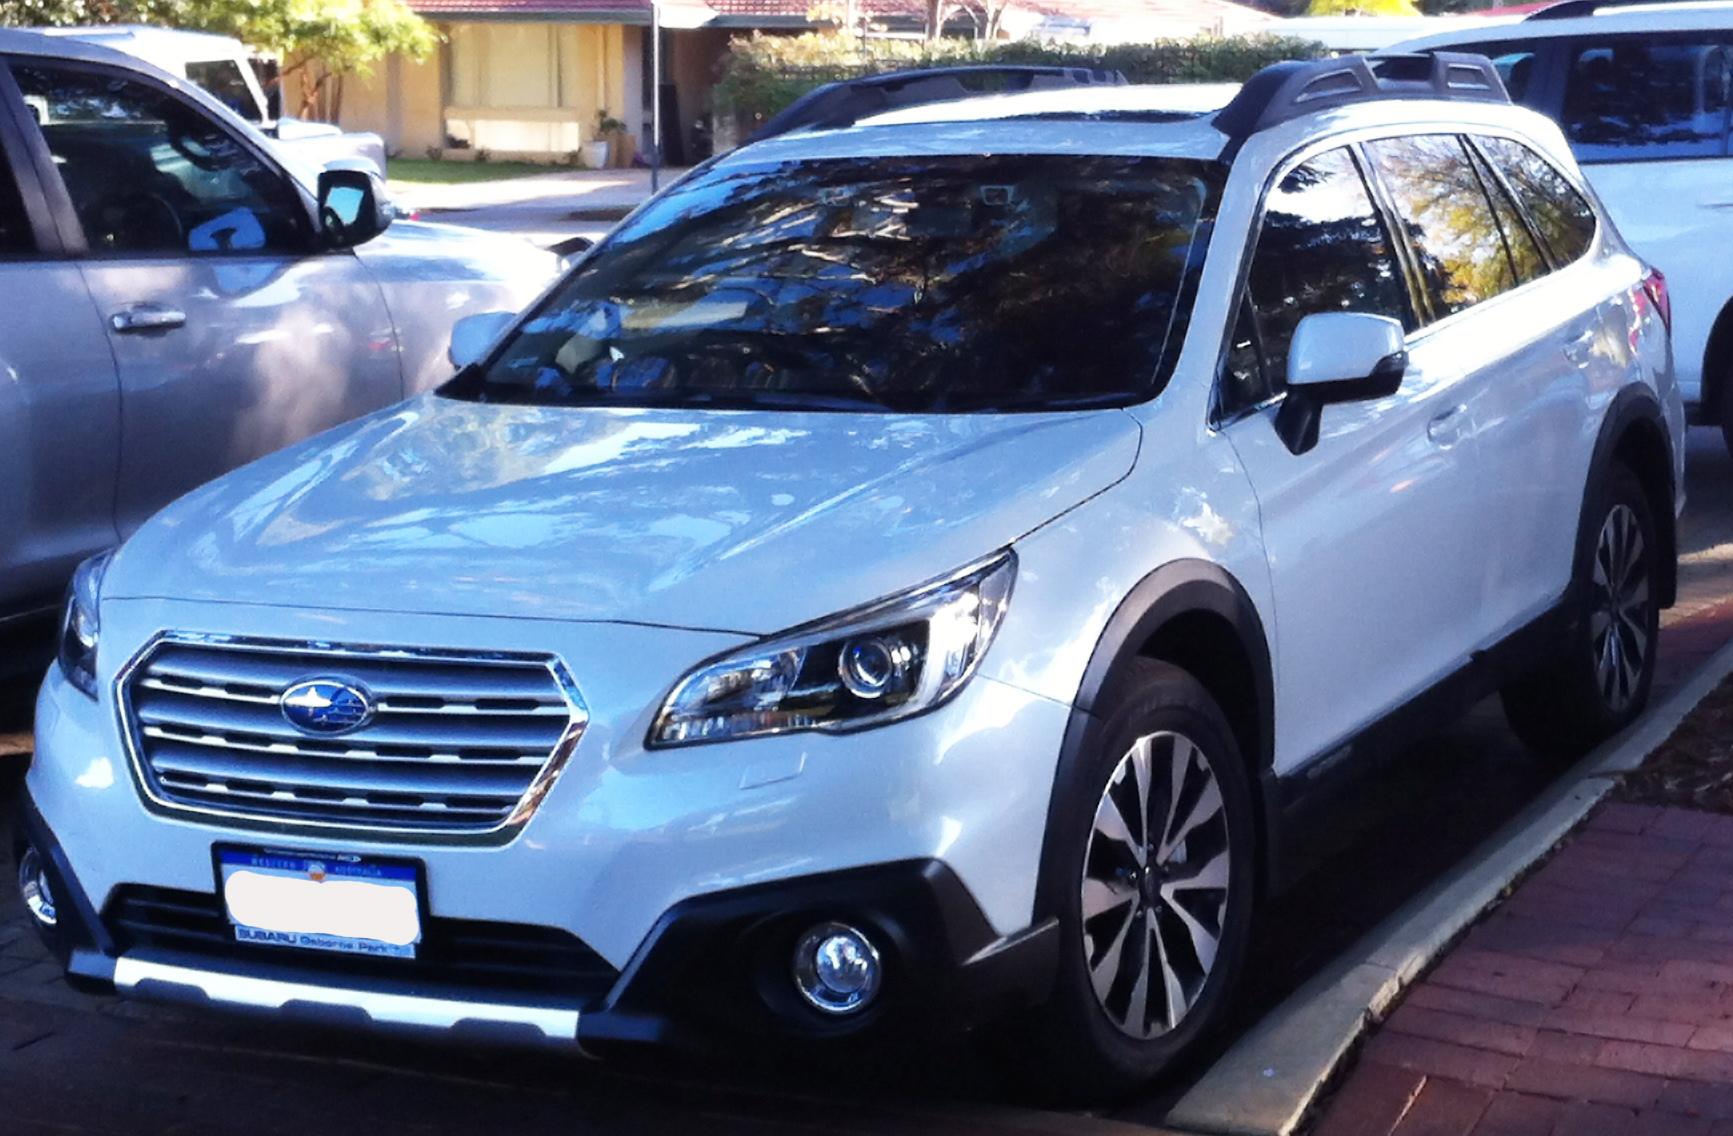 file 2015 subaru outback bs9 my15 premium station wagon 2015 06 23 jpg wikimedia commons. Black Bedroom Furniture Sets. Home Design Ideas